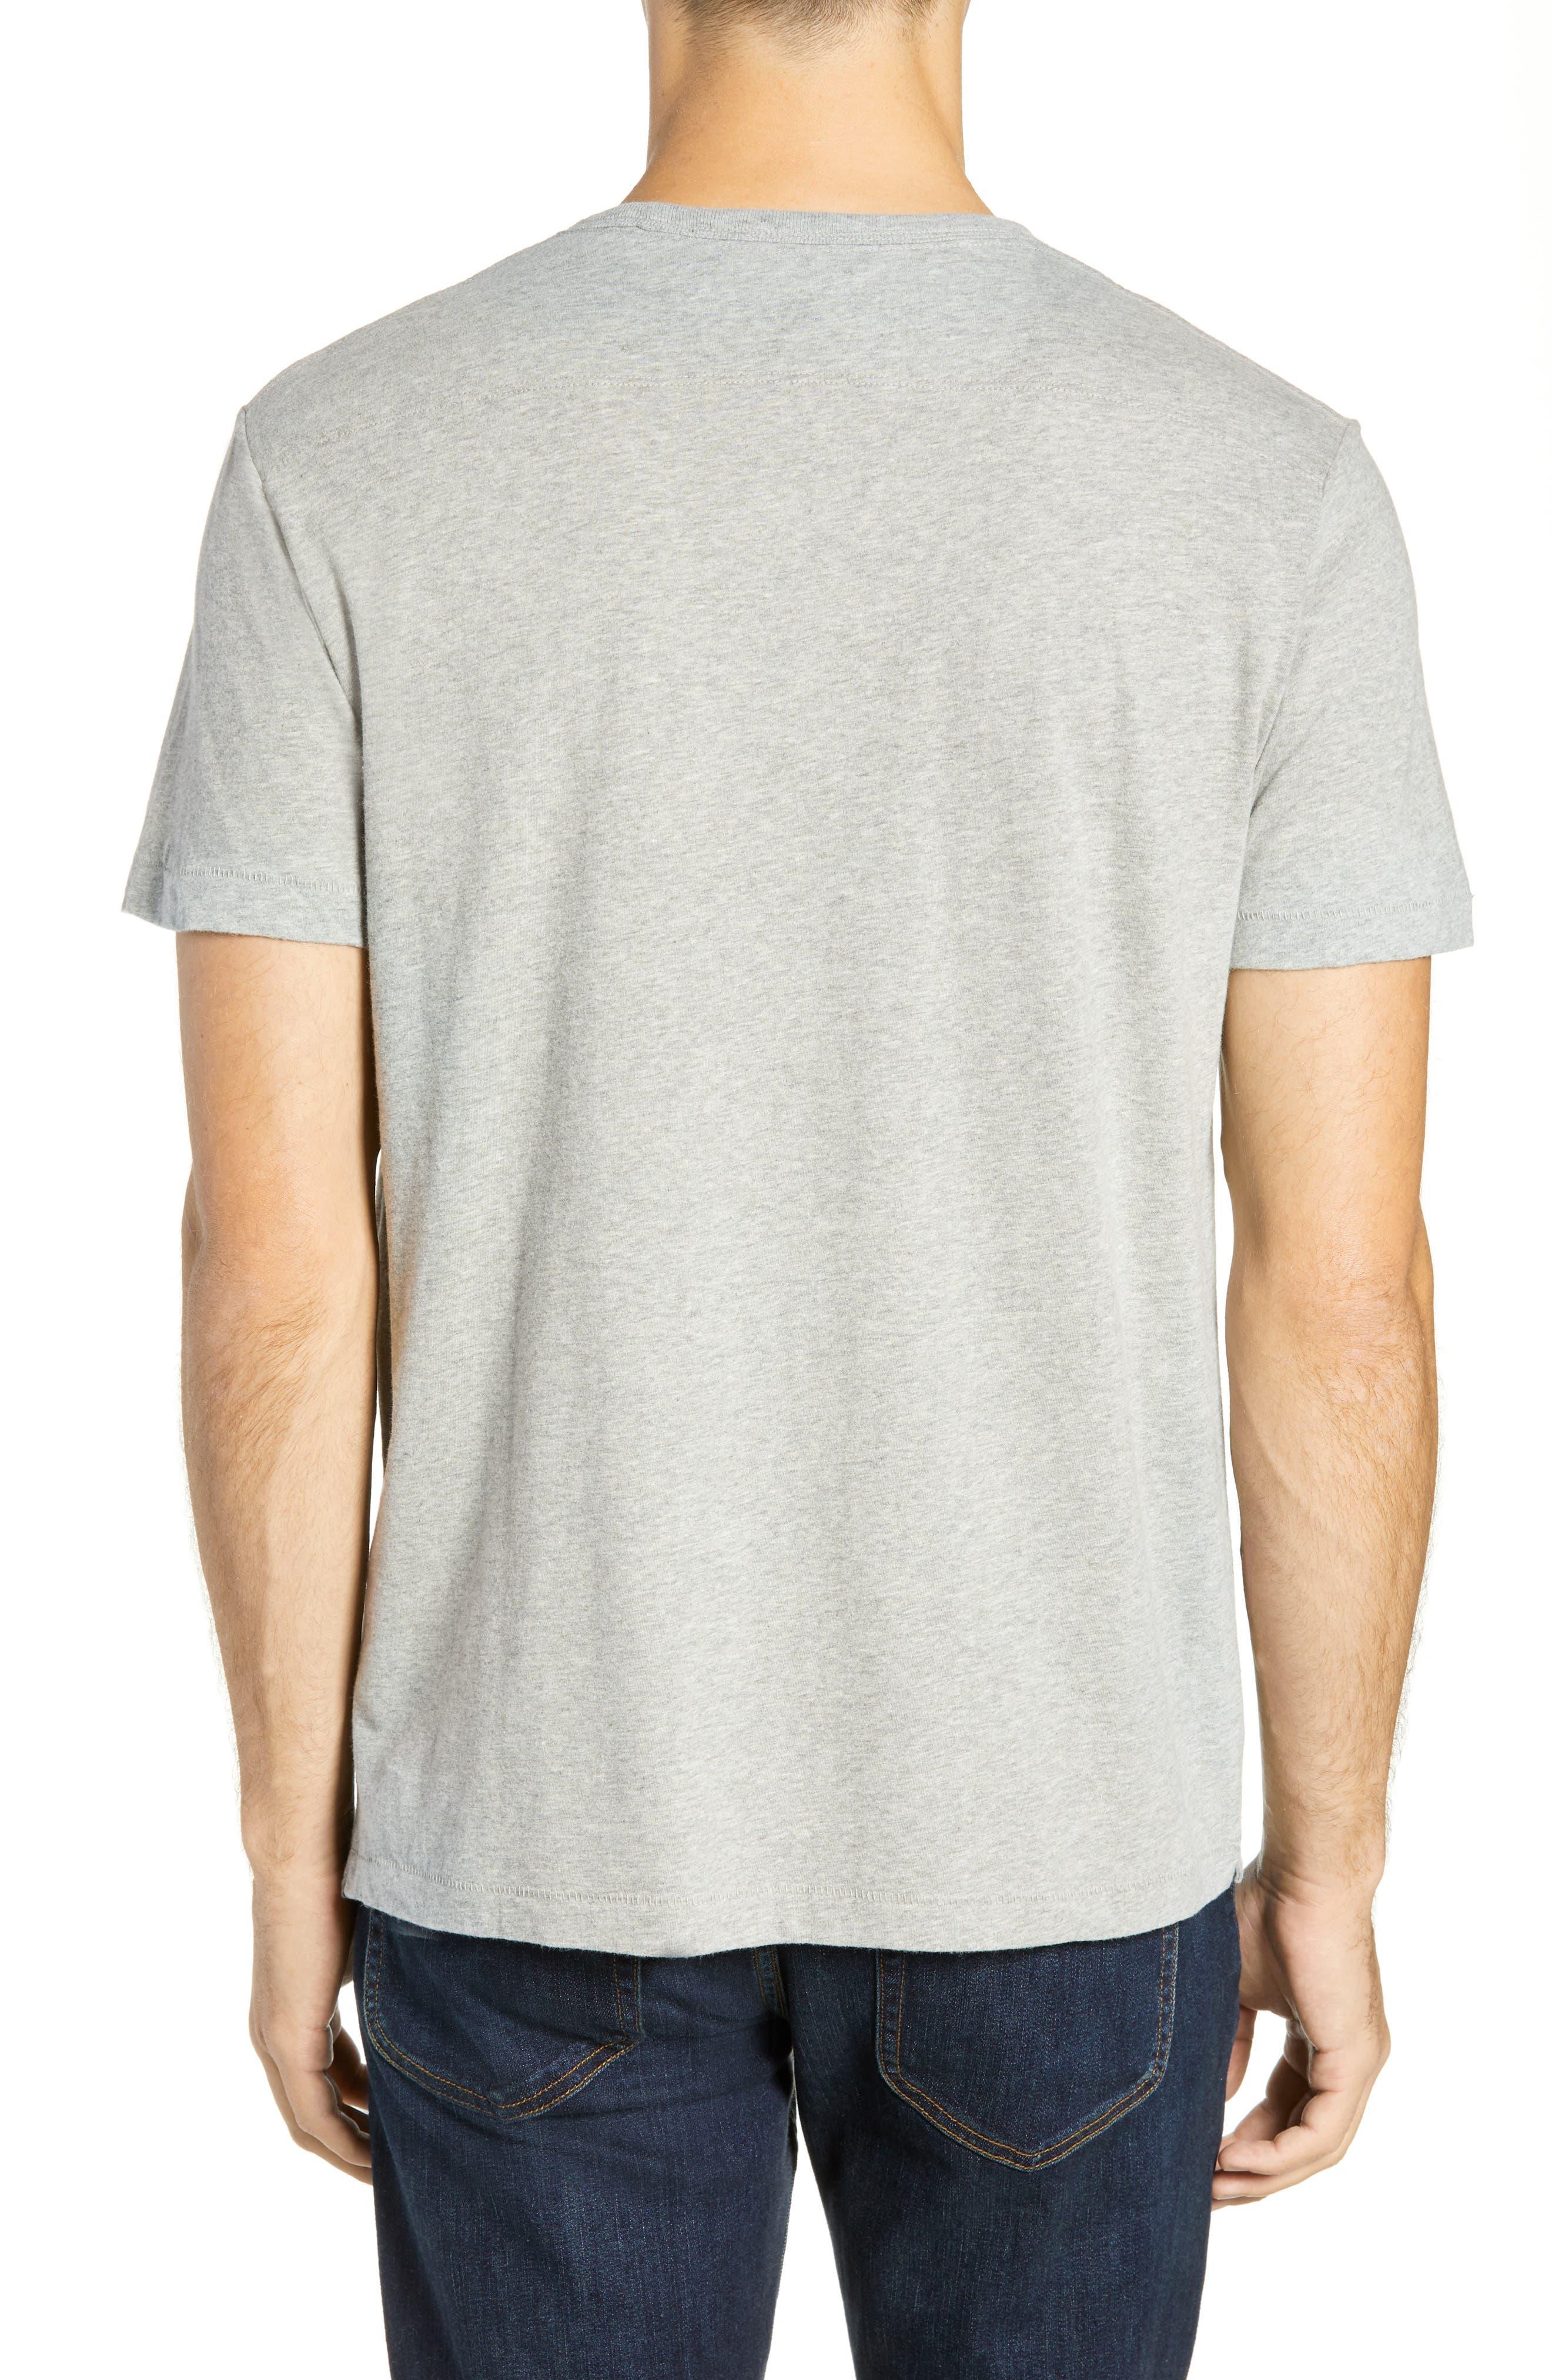 Motorcycle Regular Fit Cotton T-Shirt,                             Alternate thumbnail 2, color,                             GREY MELANGE BLACK